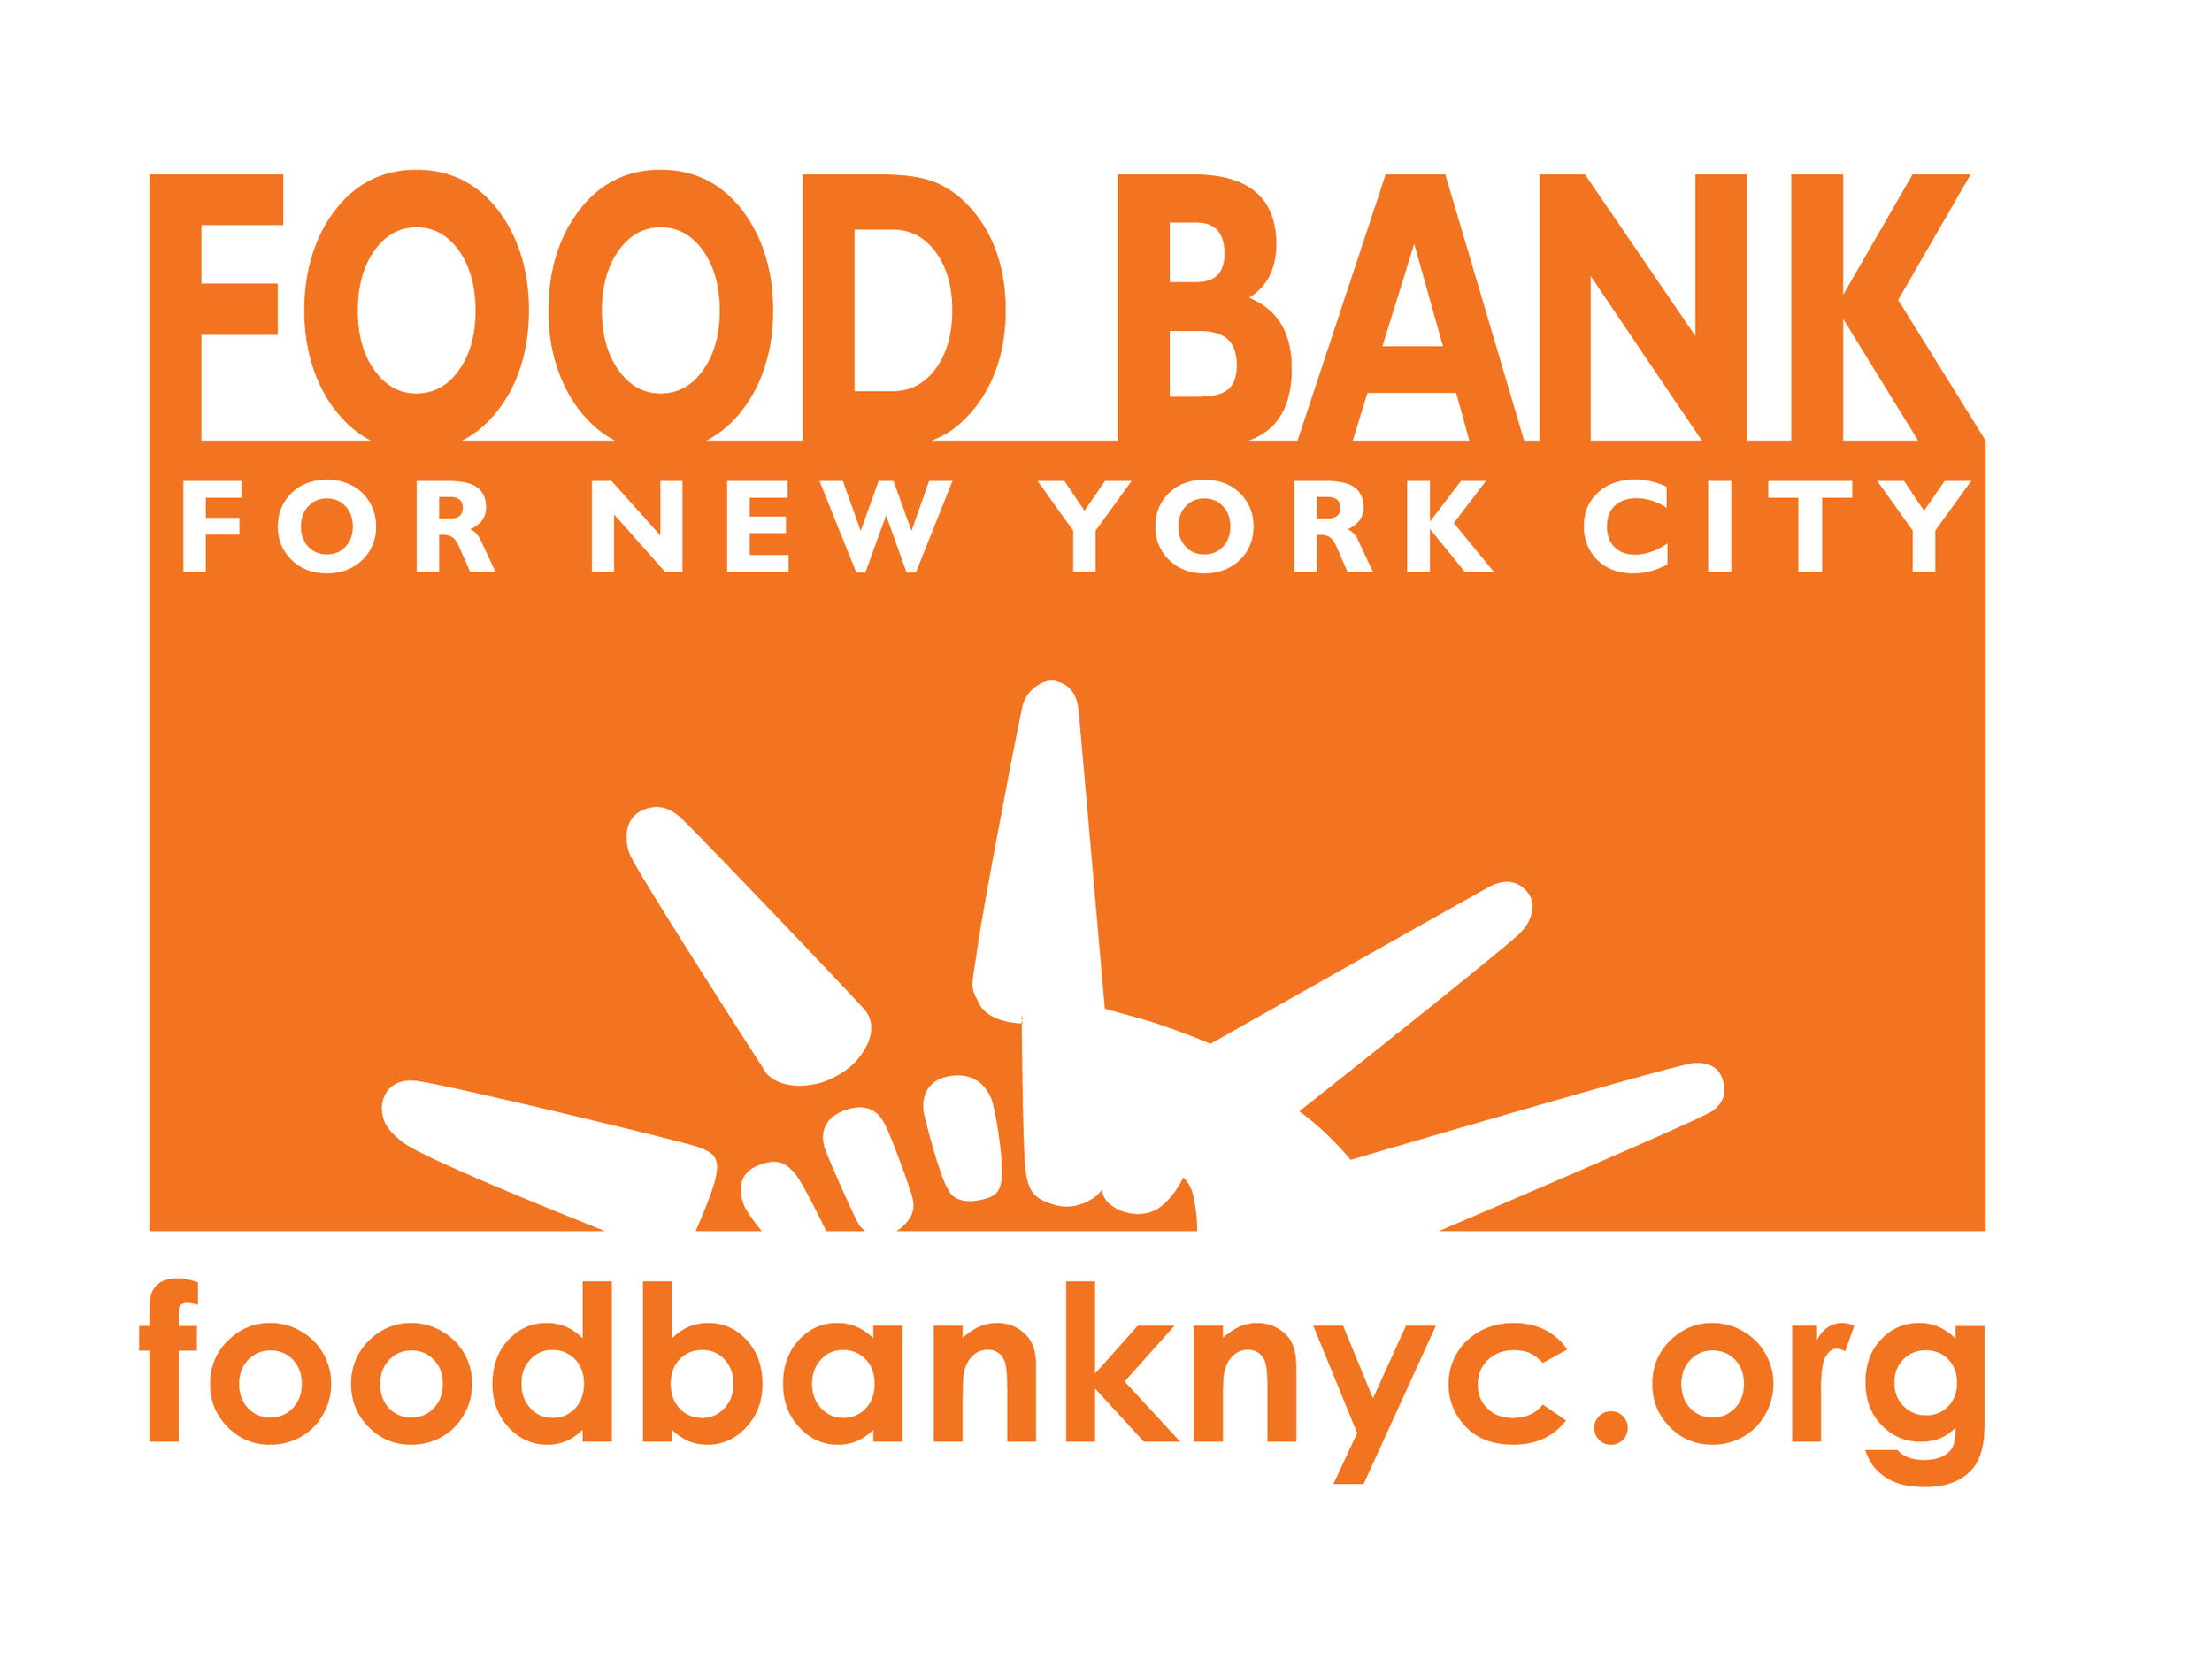 FoodBankforNYC.jpg